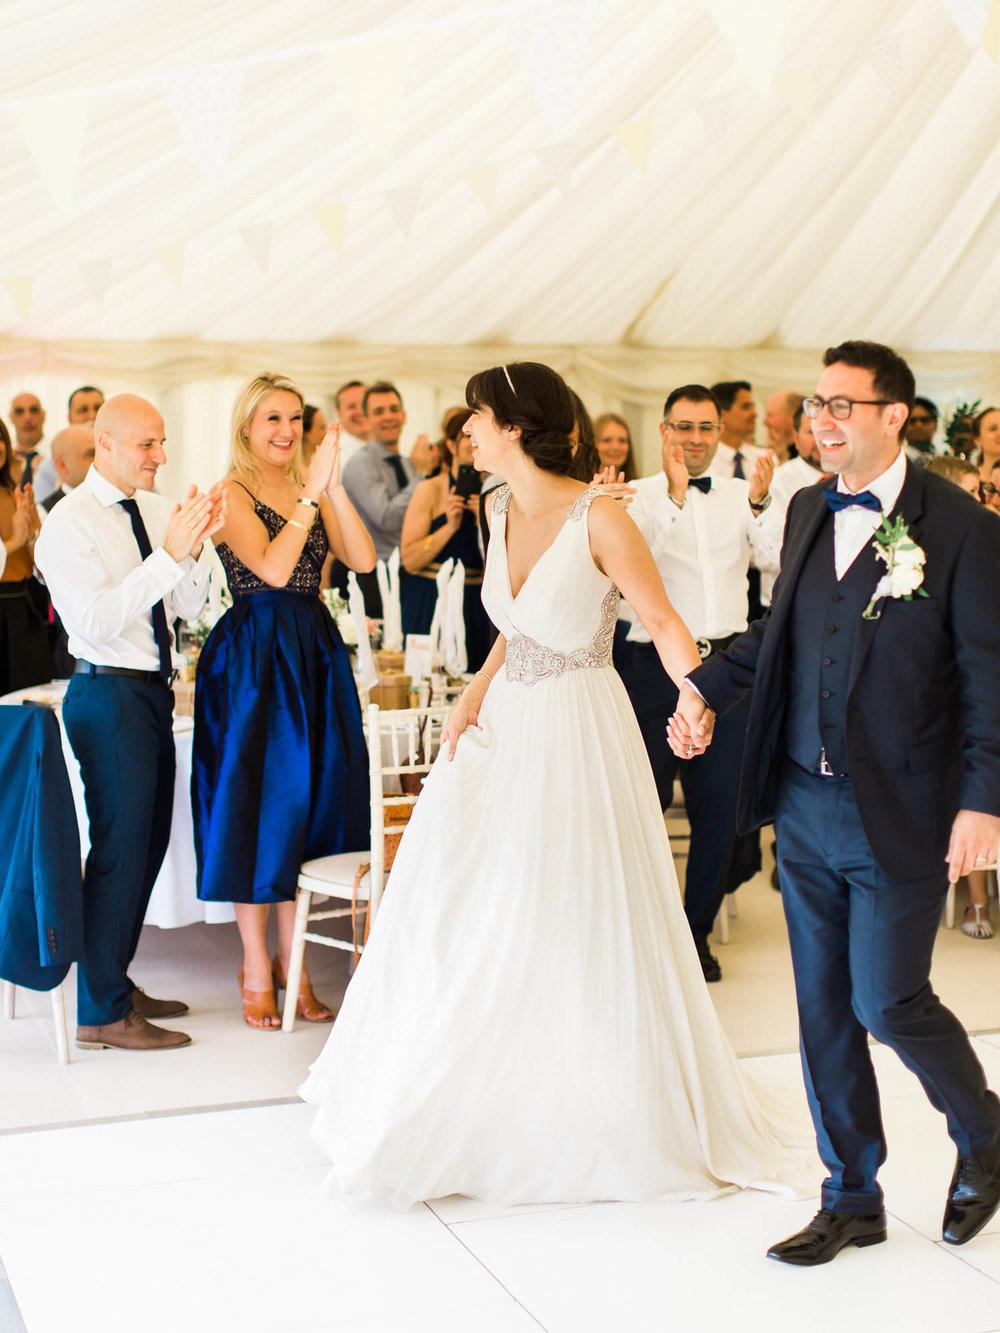 Amy O'Boyle Photography- Destination & UK Fine Art Film Wedding Photographer- Brickendonbury Estate Wedding-35.jpg